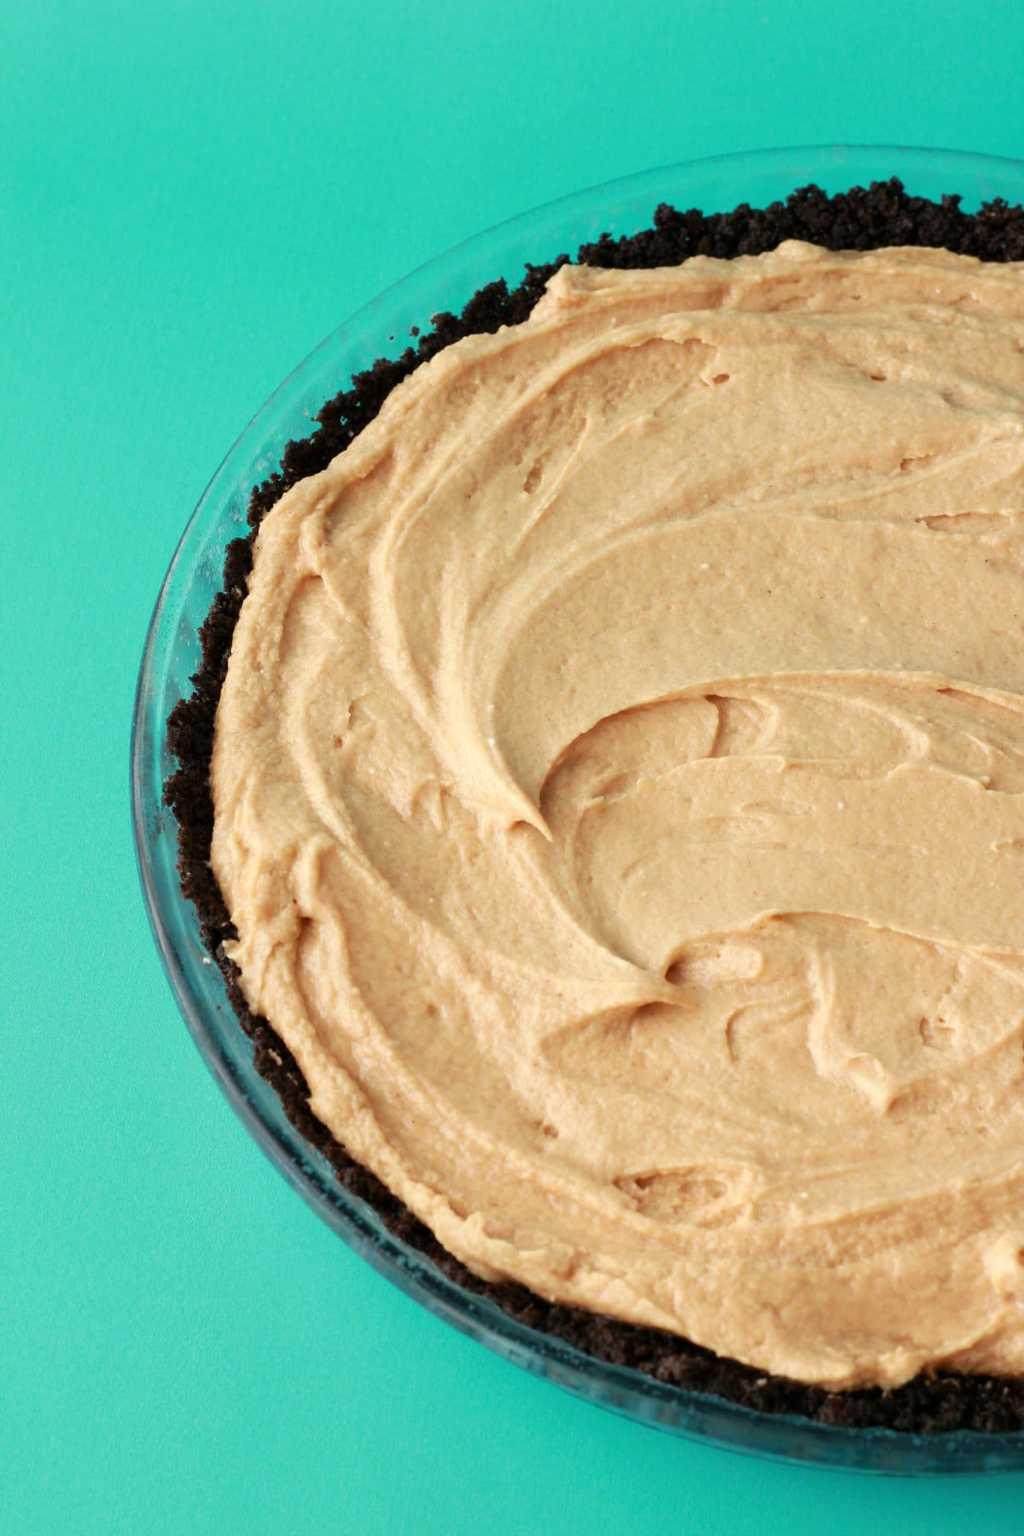 Vegan Peanut Butter Pie. Creamy Peanut Butter Filling. #vegan #lovingitvegan #peanutbutterpie #dessert